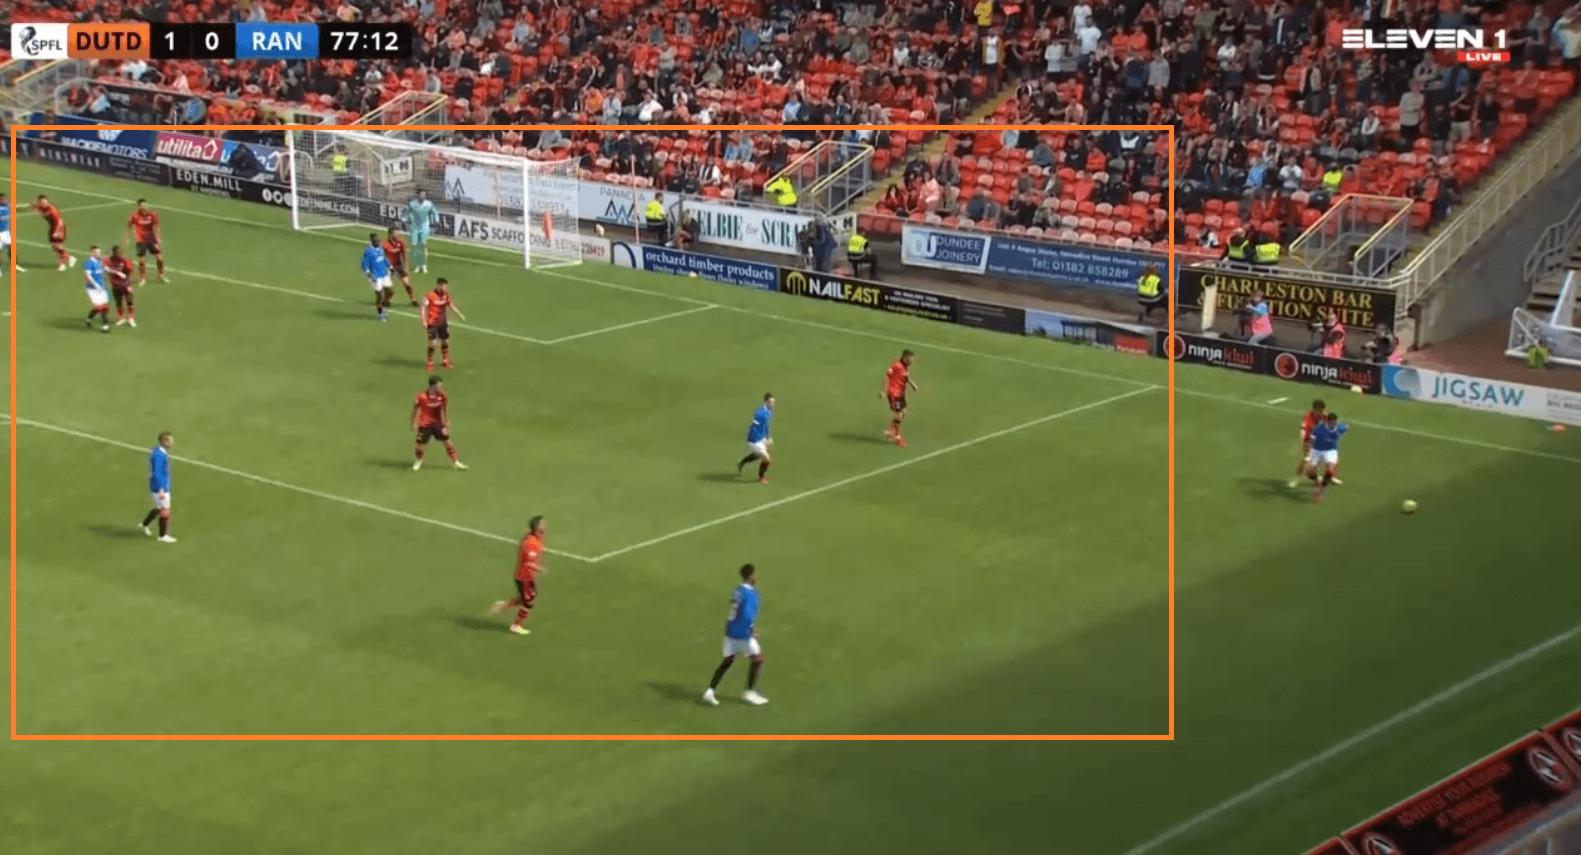 2021/22 Scottish Premiership: Dundee United's stoic defending ends Rangers' historic unbeaten run - tactical analysis tactics